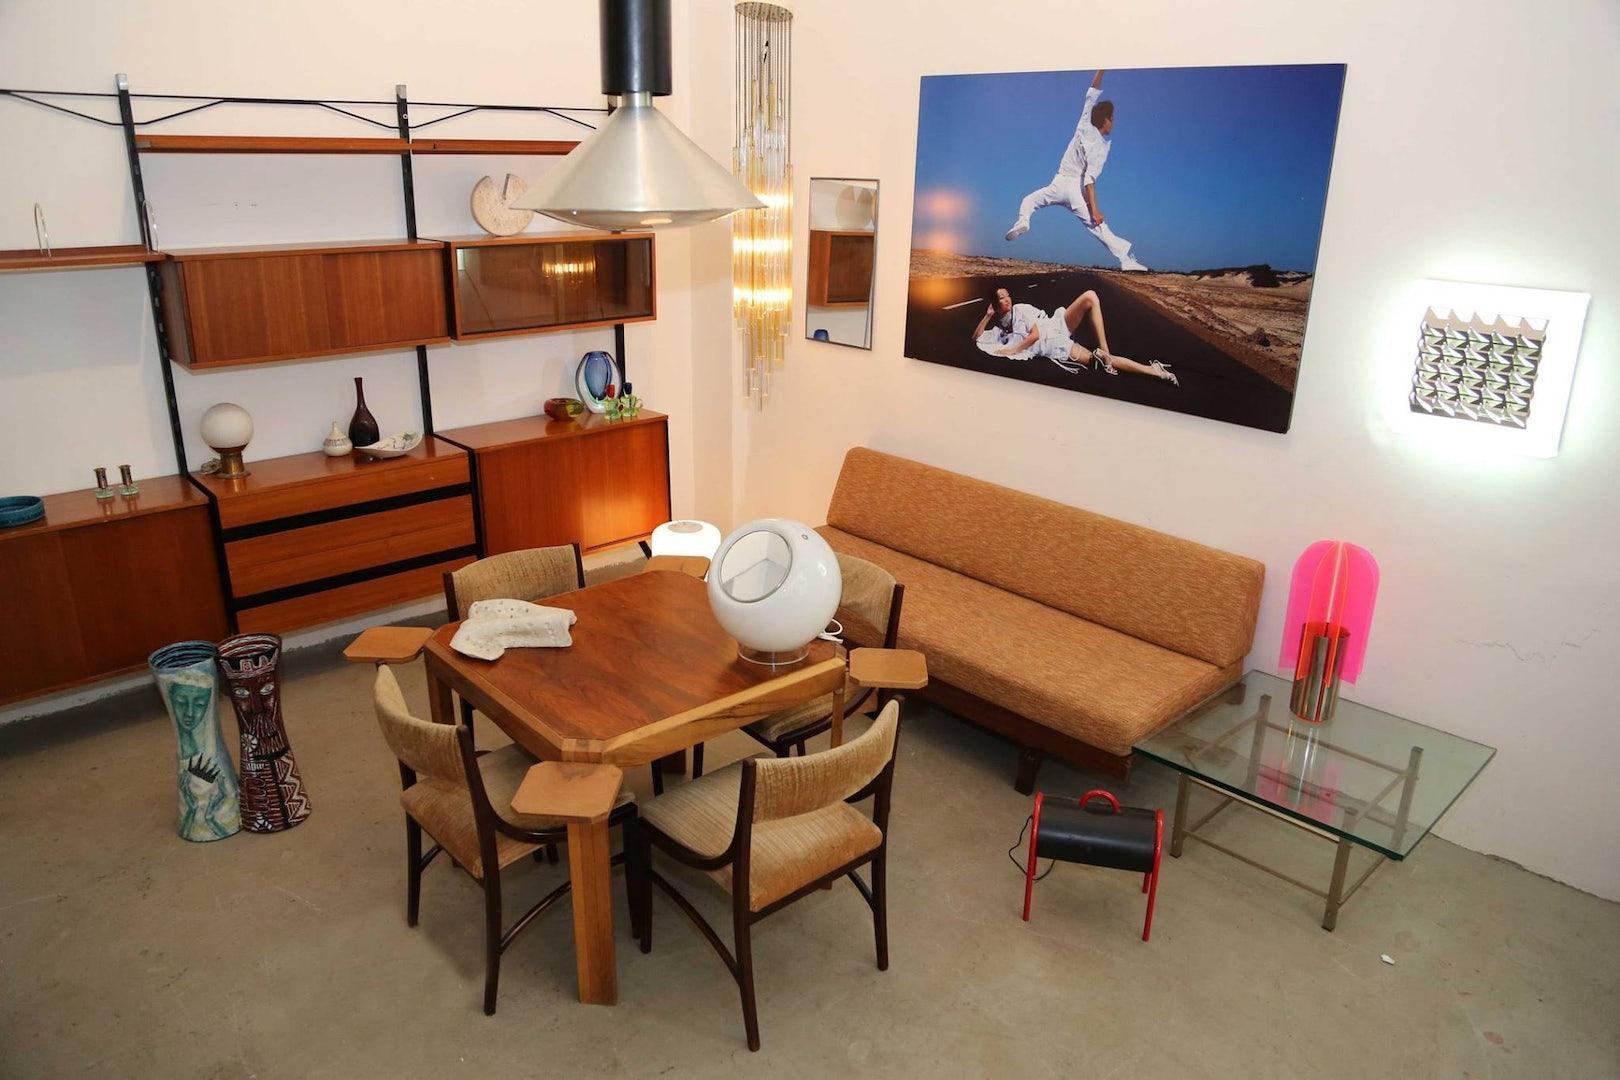 vintage furniture at Lamps60